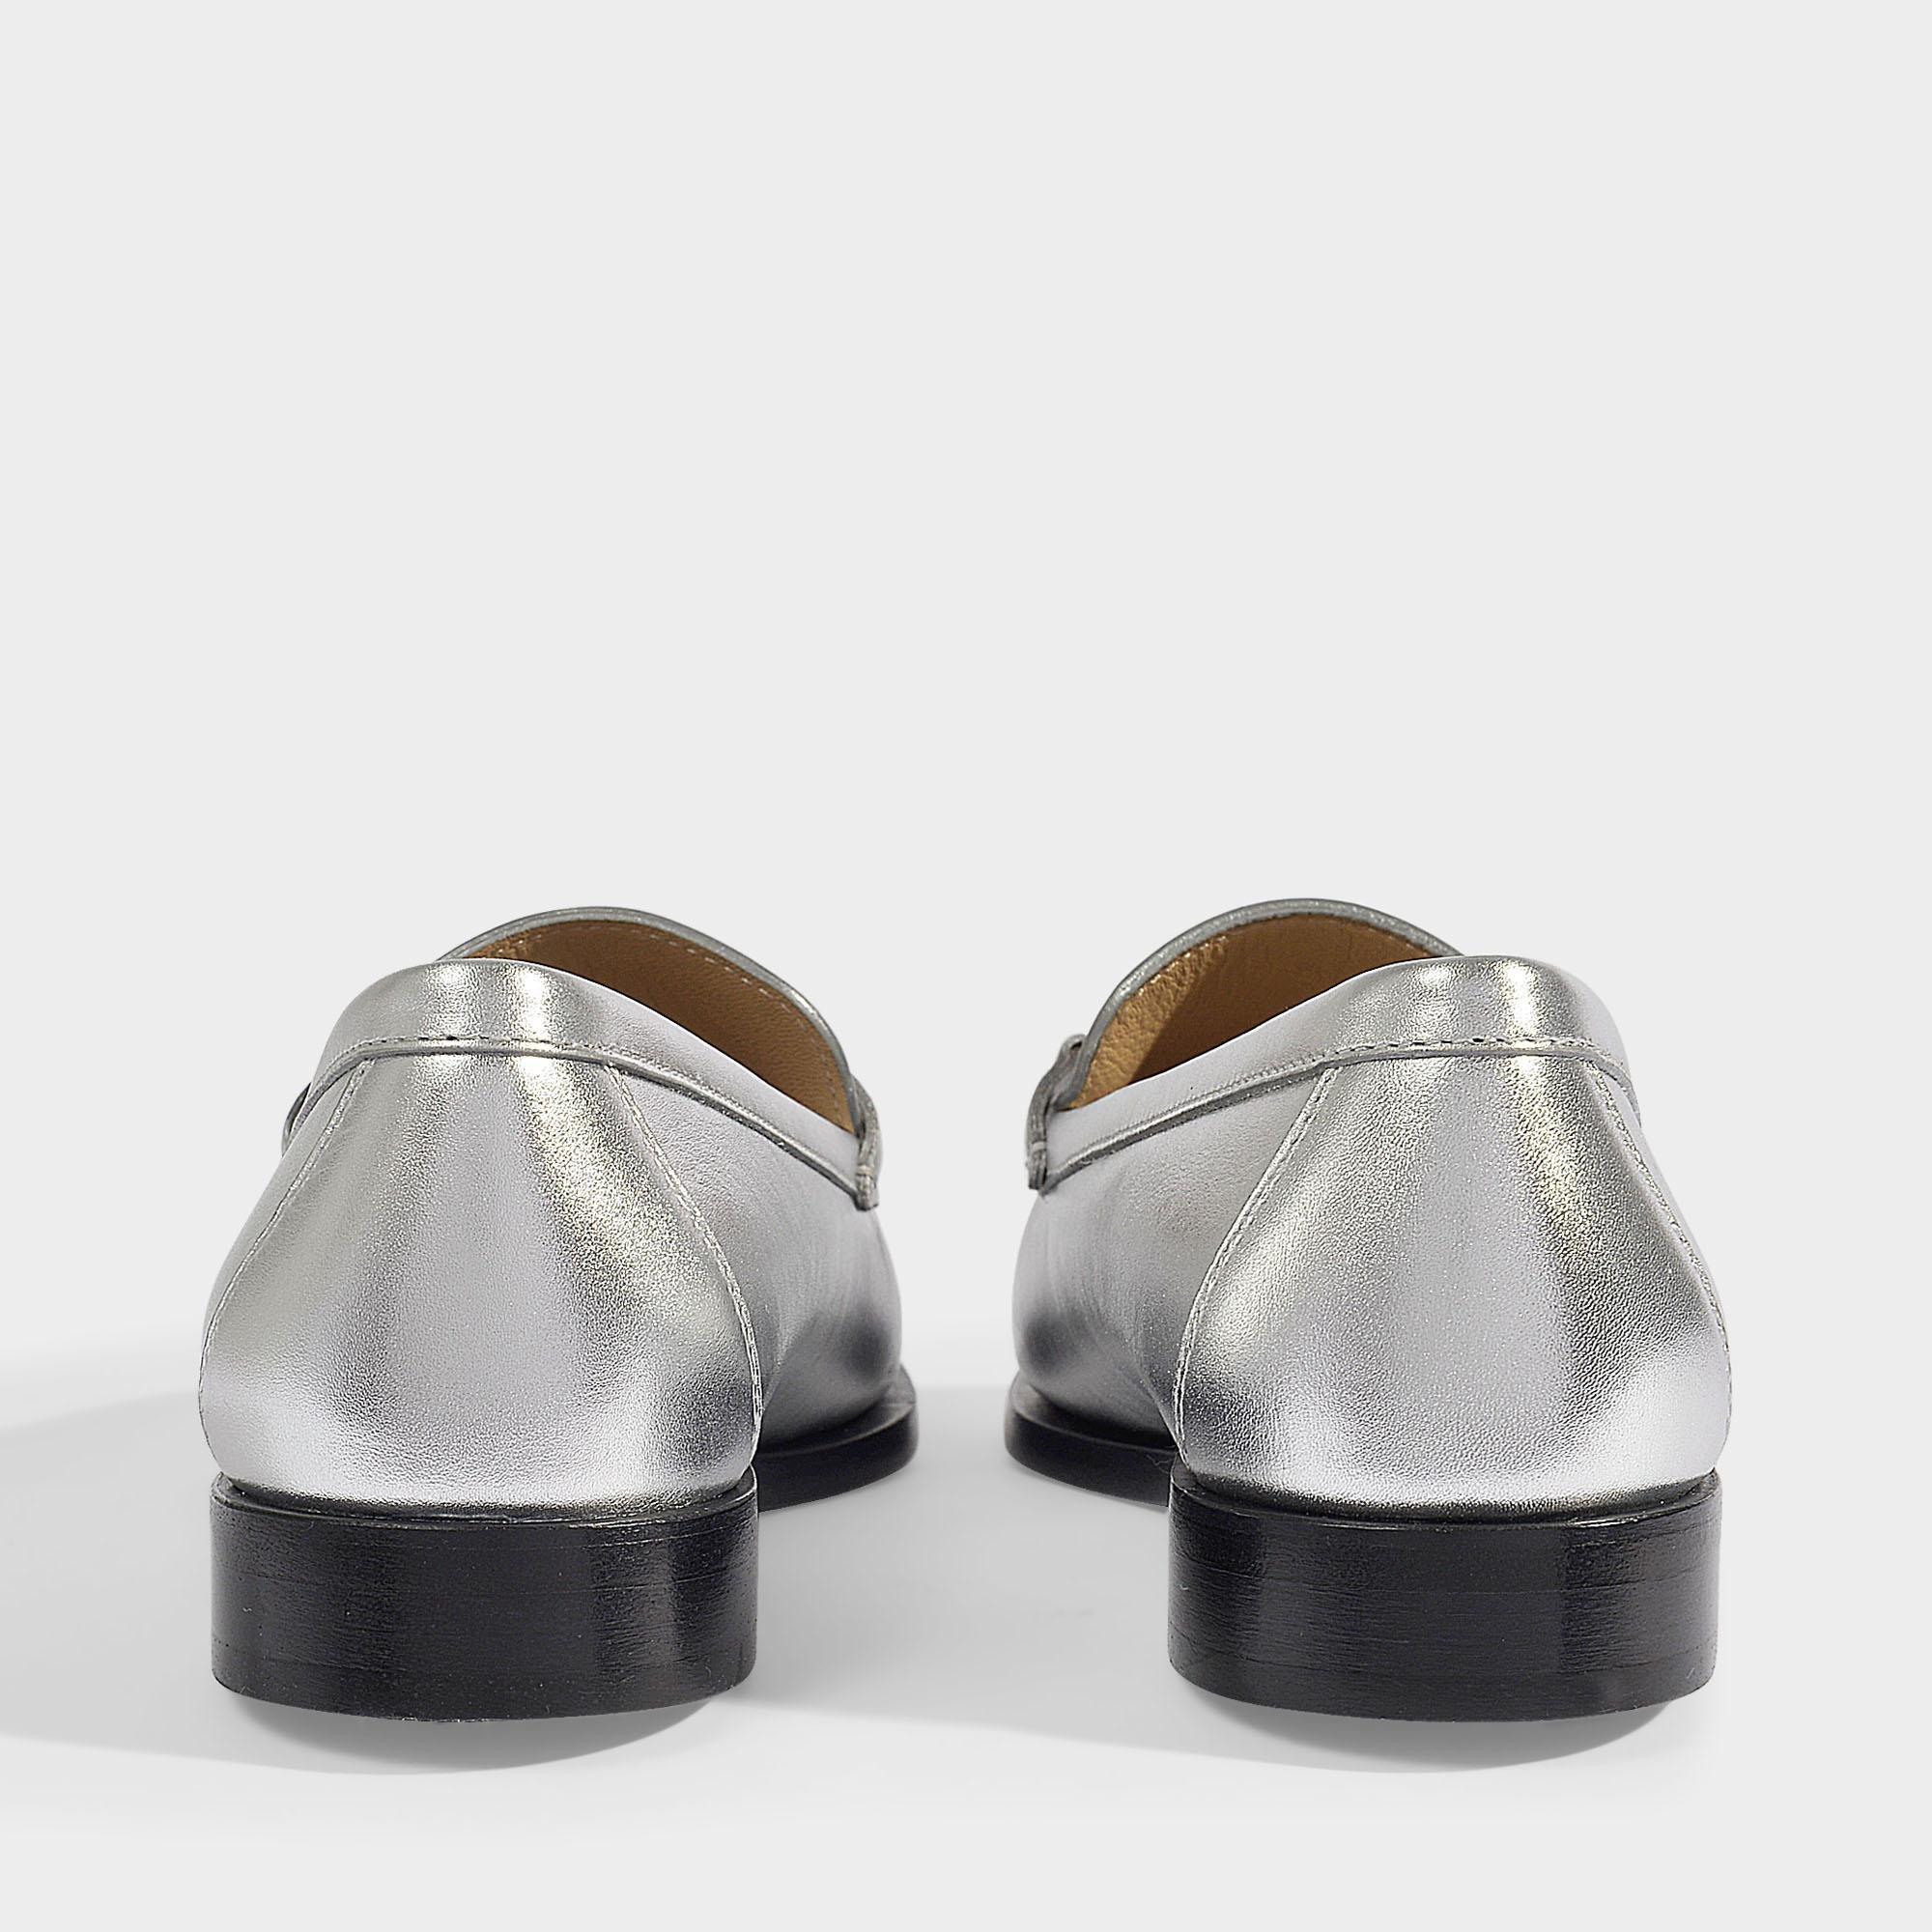 595b87303f74 Lyst - Ferragamo Rola Reversible Logo Moccasins In Silver Nappa ...